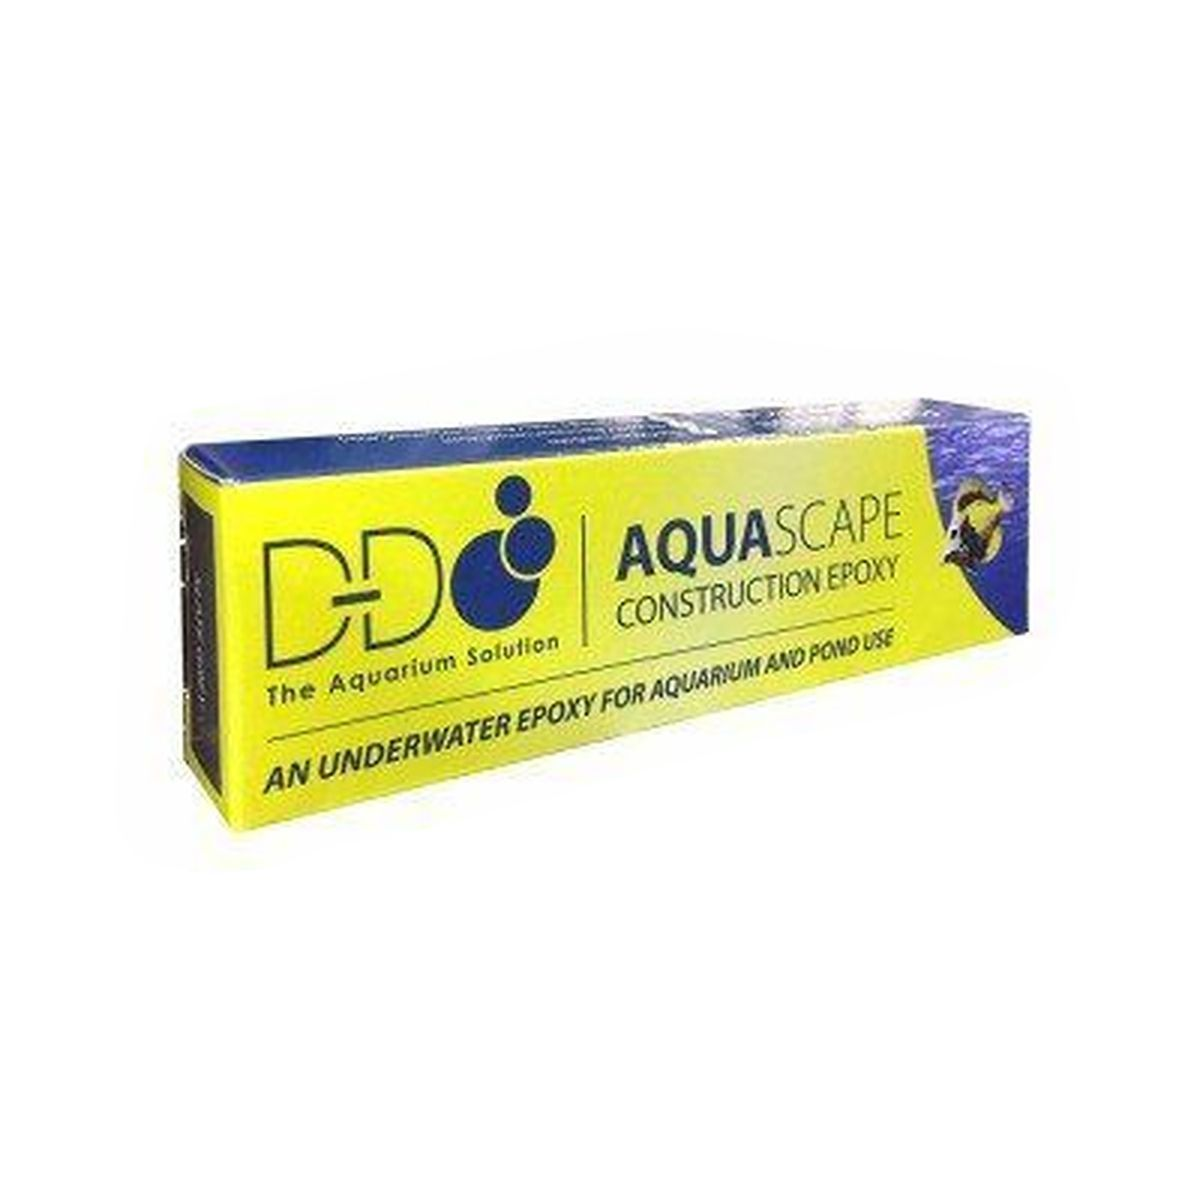 Aqua Scape Epoxy Durepox P/ Aquario Coral Rocha